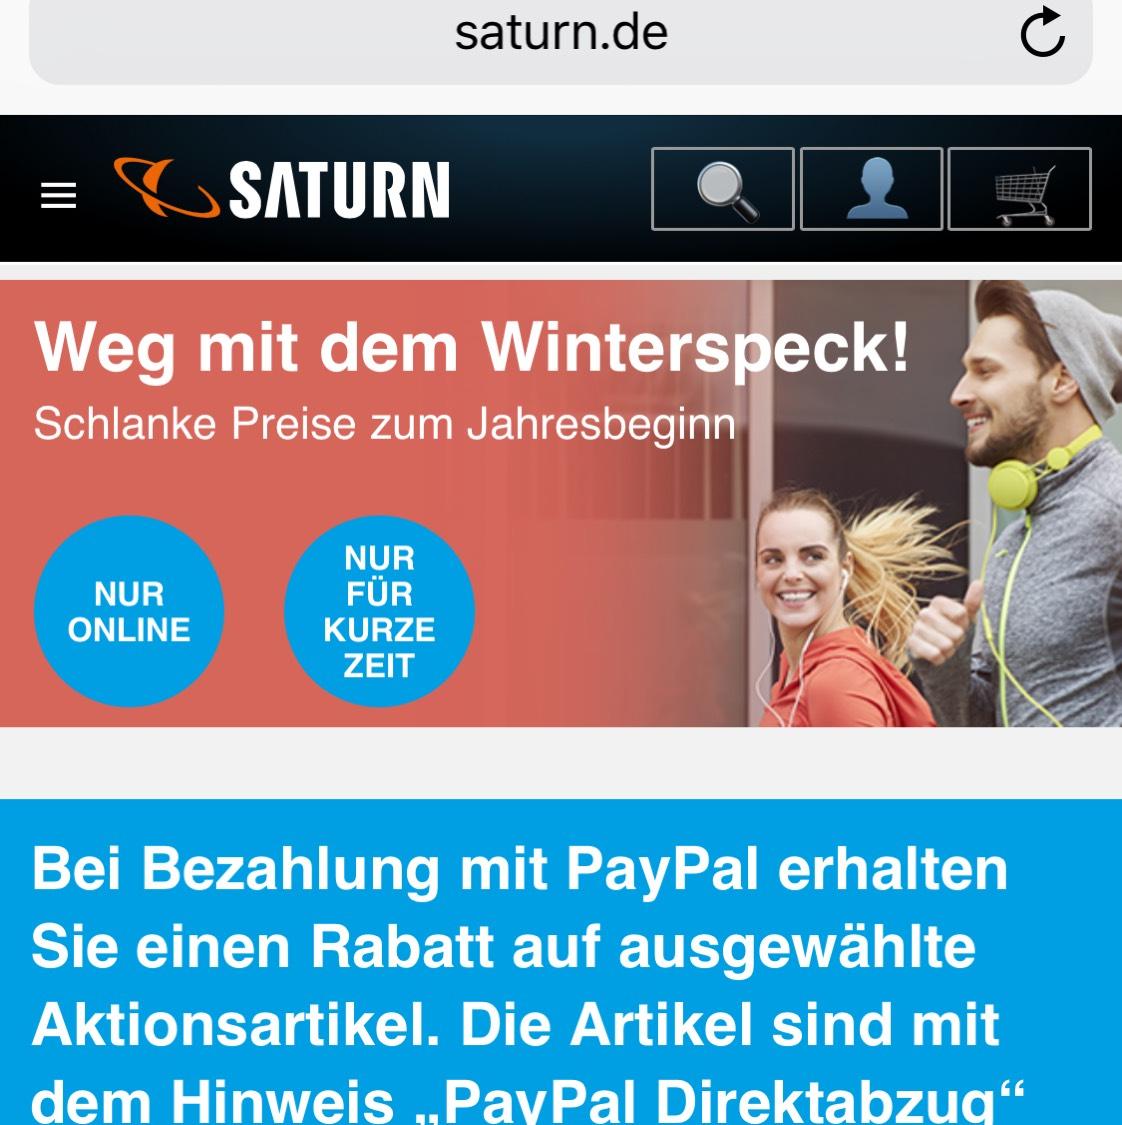 Saturn PayPal Direkt Abzug bei diversen Artikel